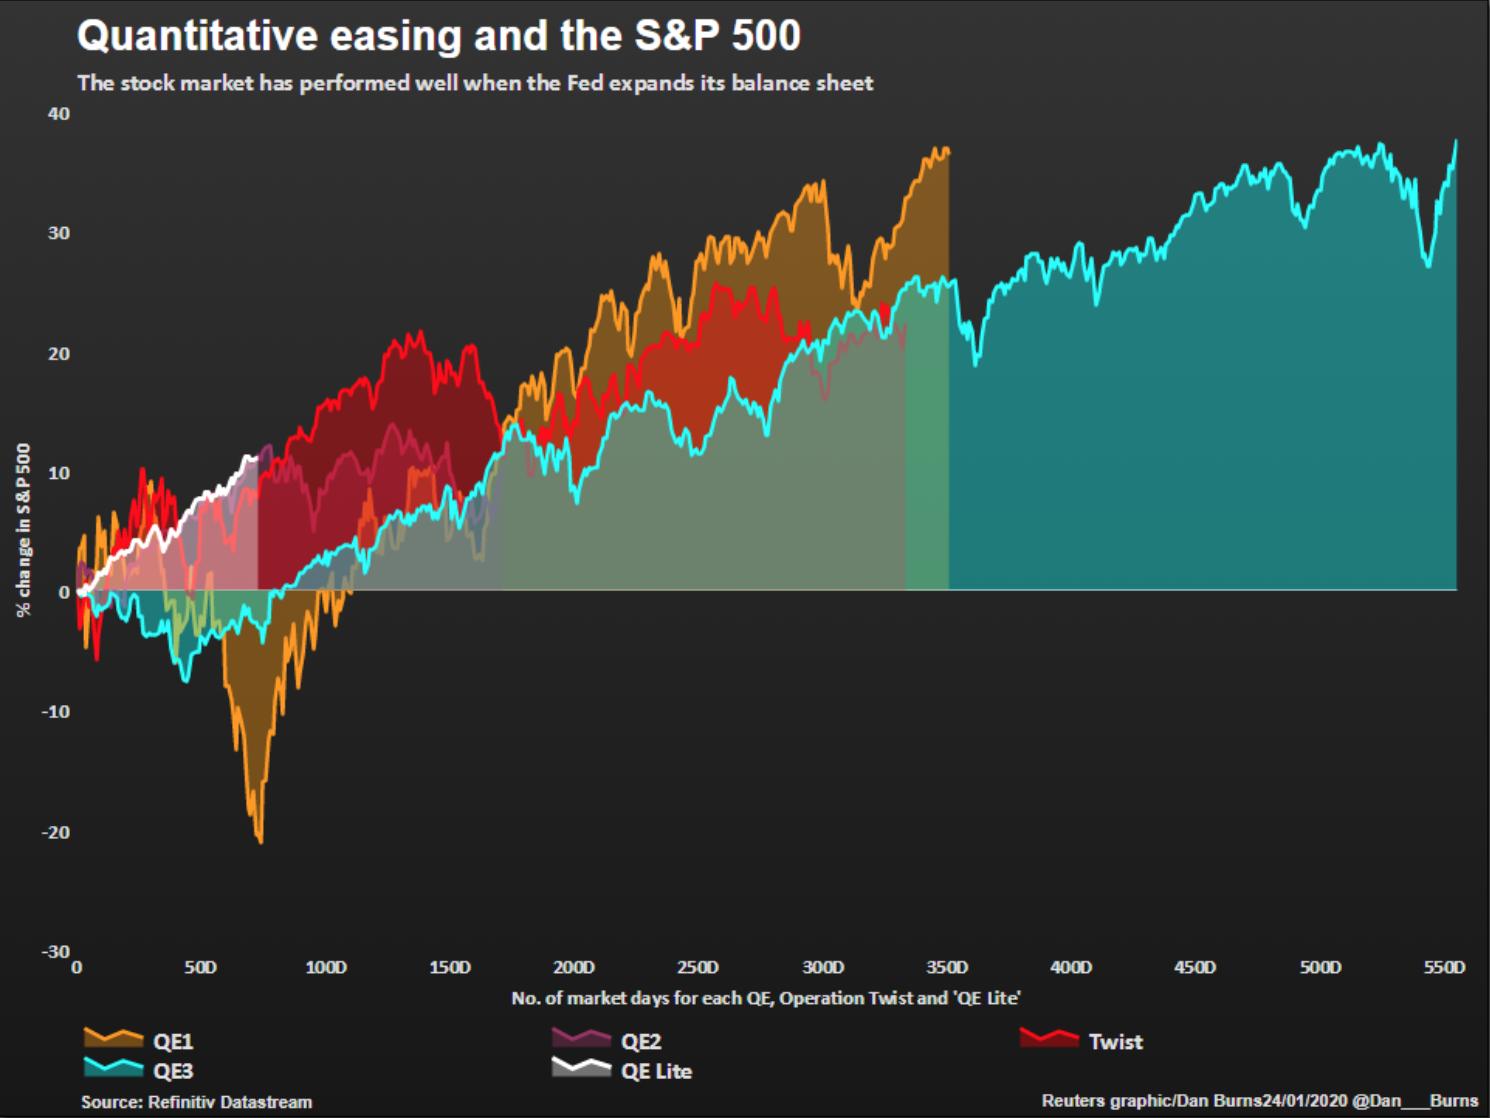 Increasing Stock Market Concerns